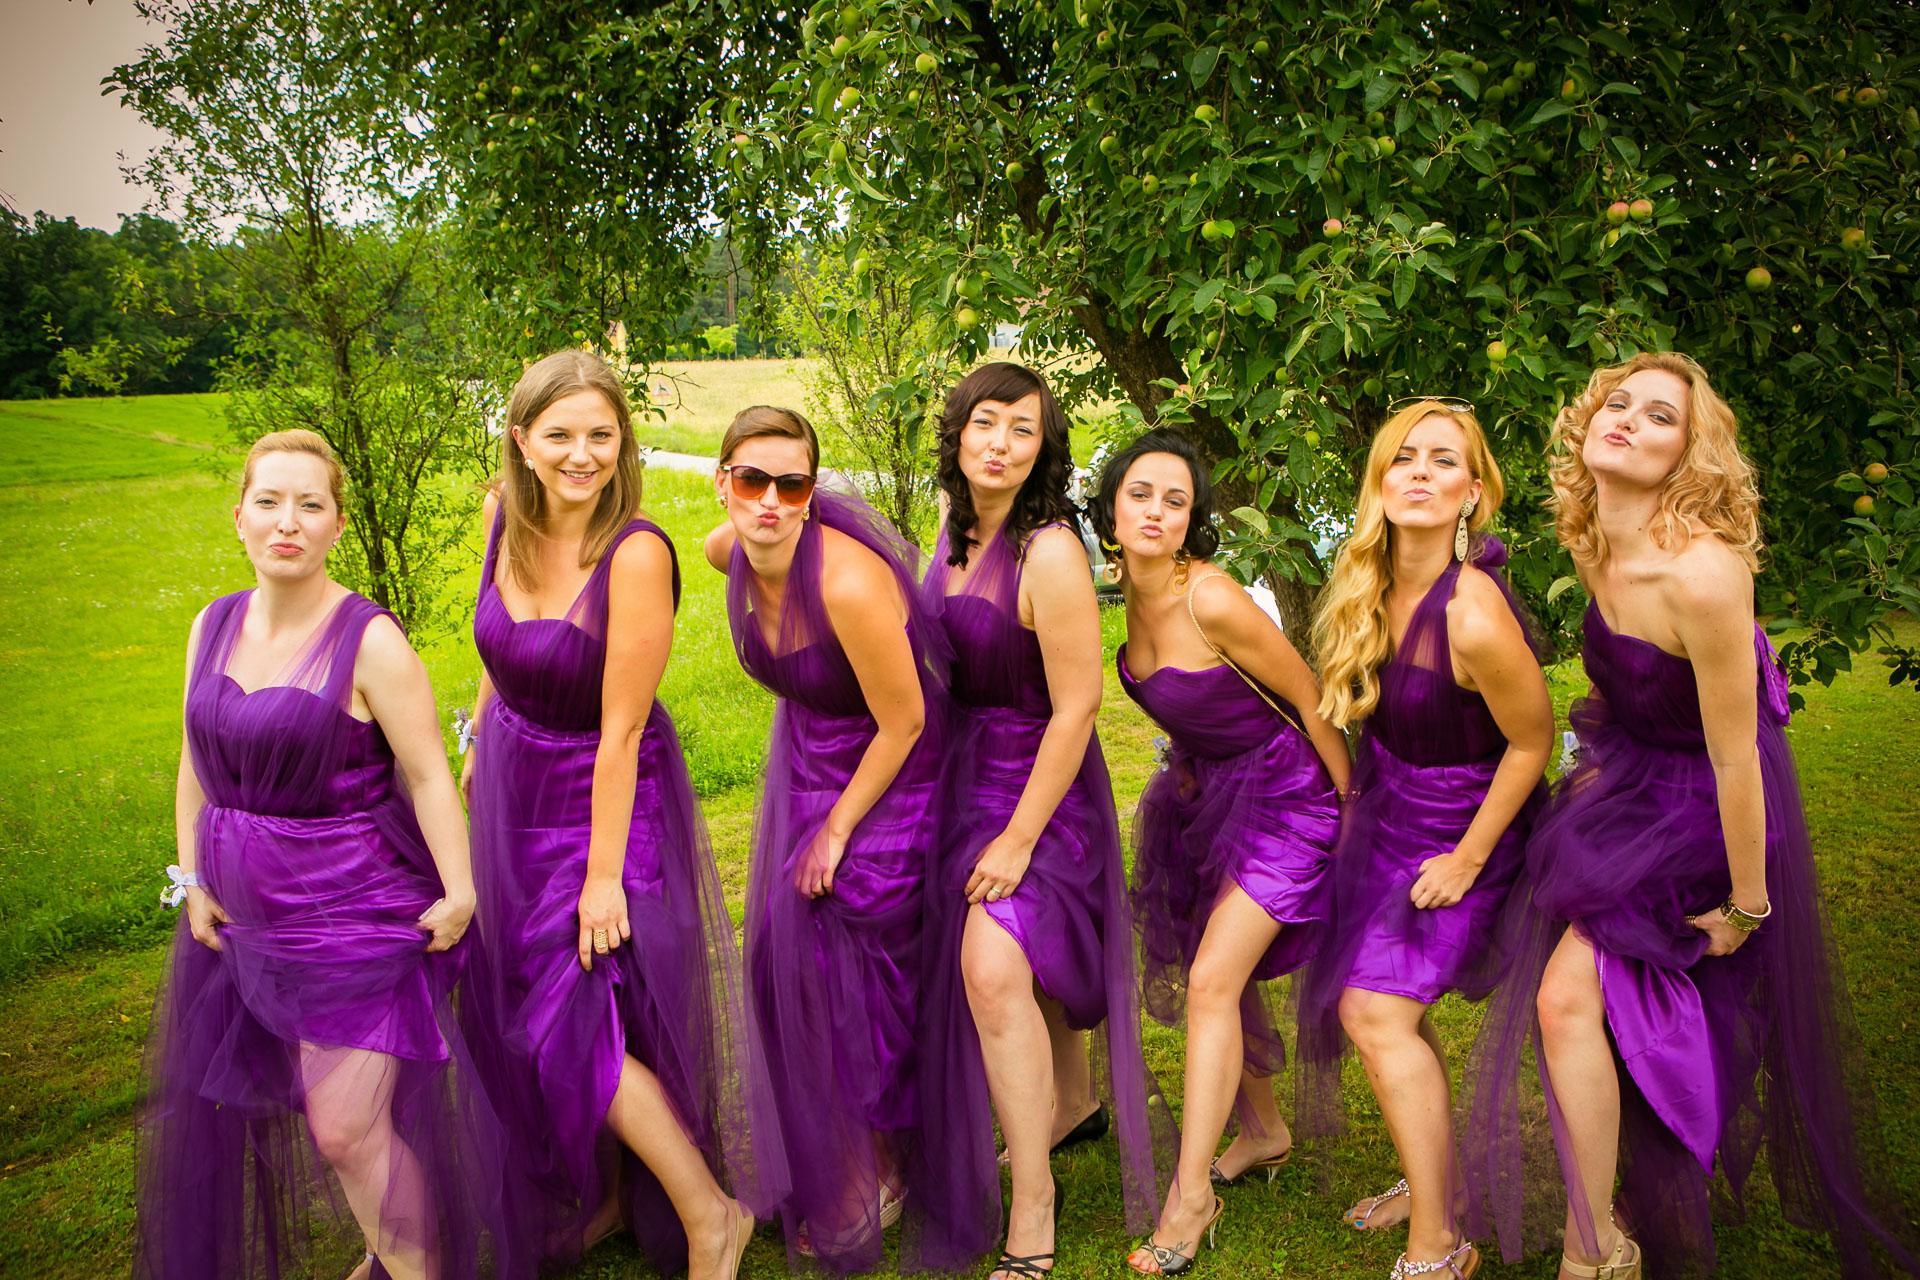 Foto zate, photoforyou, canon, canon_photos, canonglobal, fineartweddings, weddinginsp, fineartbride, weddingdream, realwedding, weddingphotomag, hochzeitinspiration, weddingideas, hairaten, vintagewedding, vintagehochzeit, bride2018, braut2019, wedding2019, hochzeit2018, hochzeit_gluck,